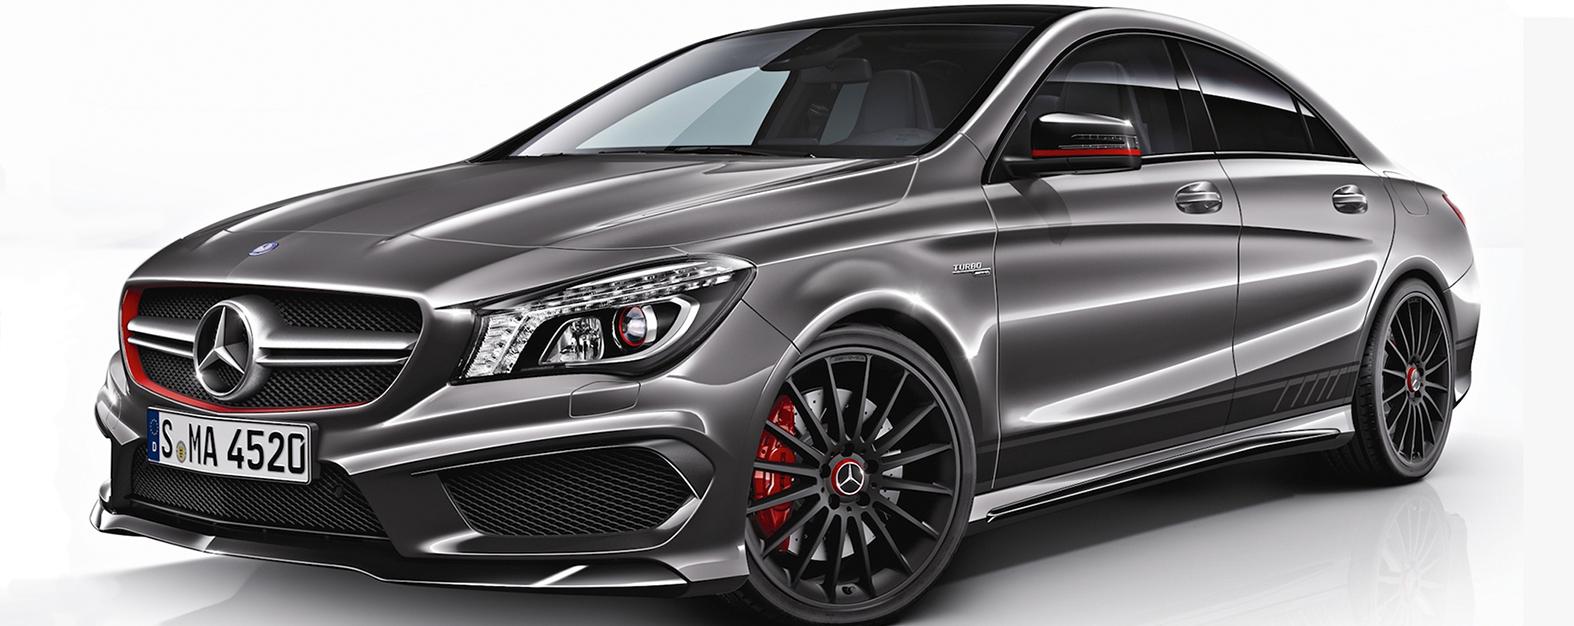 Top Prix location voiture de luxe - u car 33 PI65